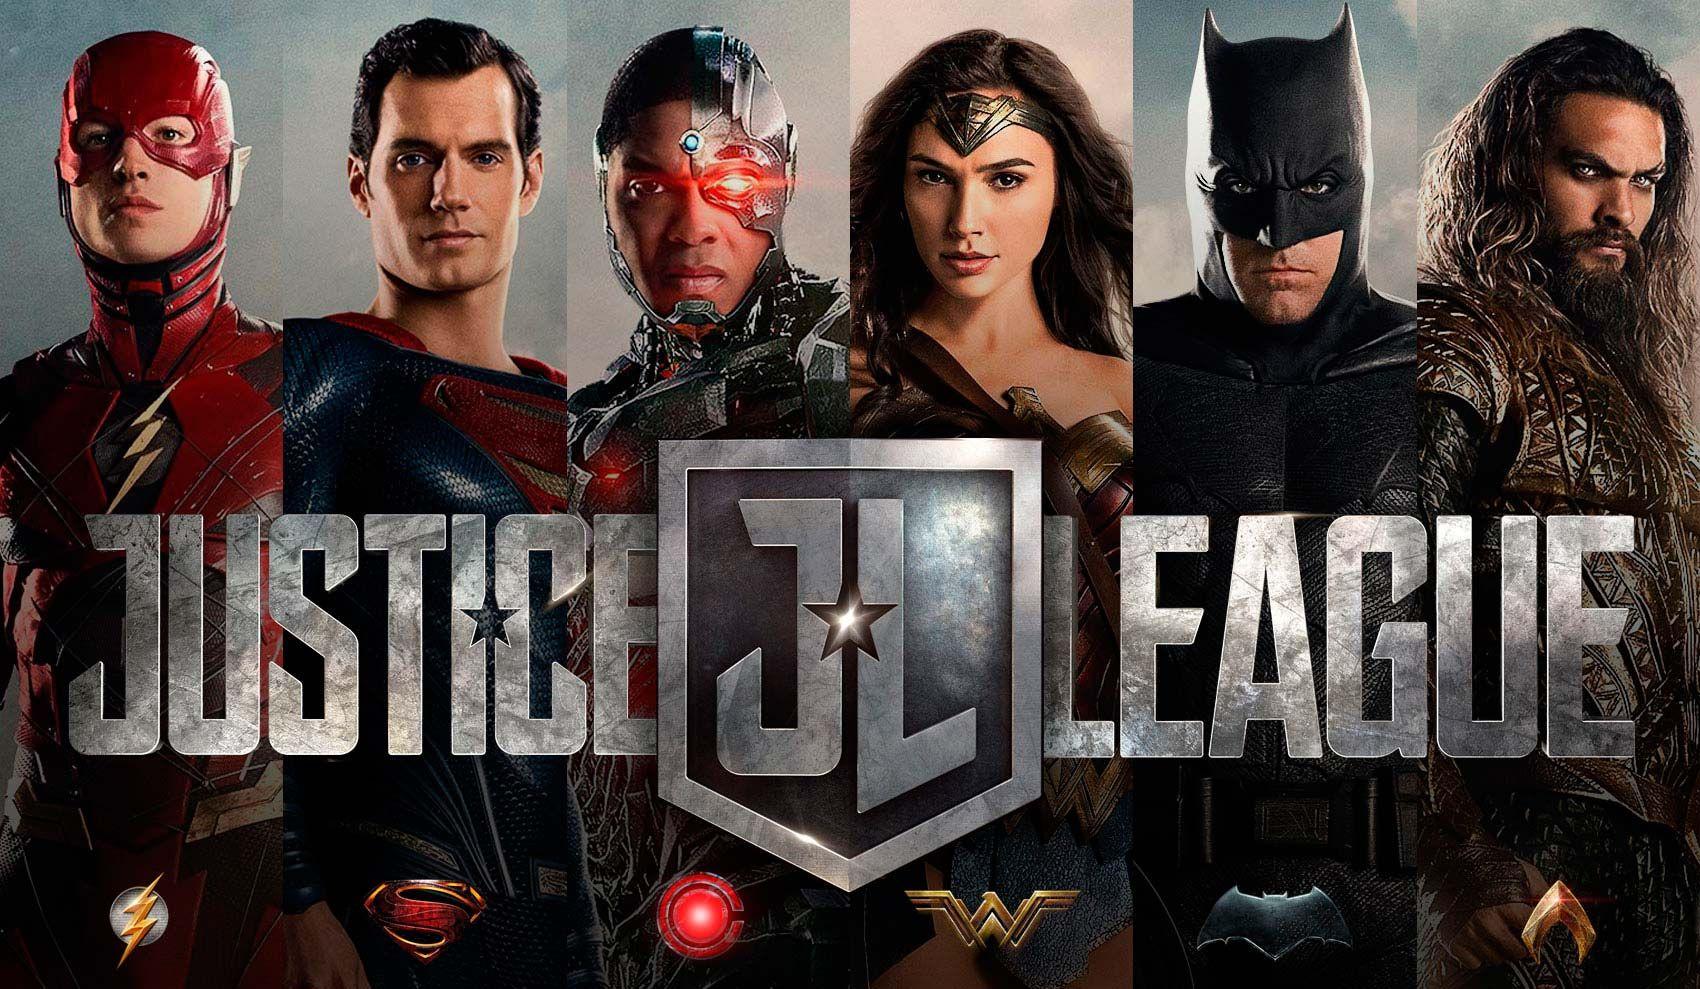 Liga Justicia Logos Protagonistas Jpg 1700 989 Liga De La Justicia 2017 Liga De La Justicia Justice League